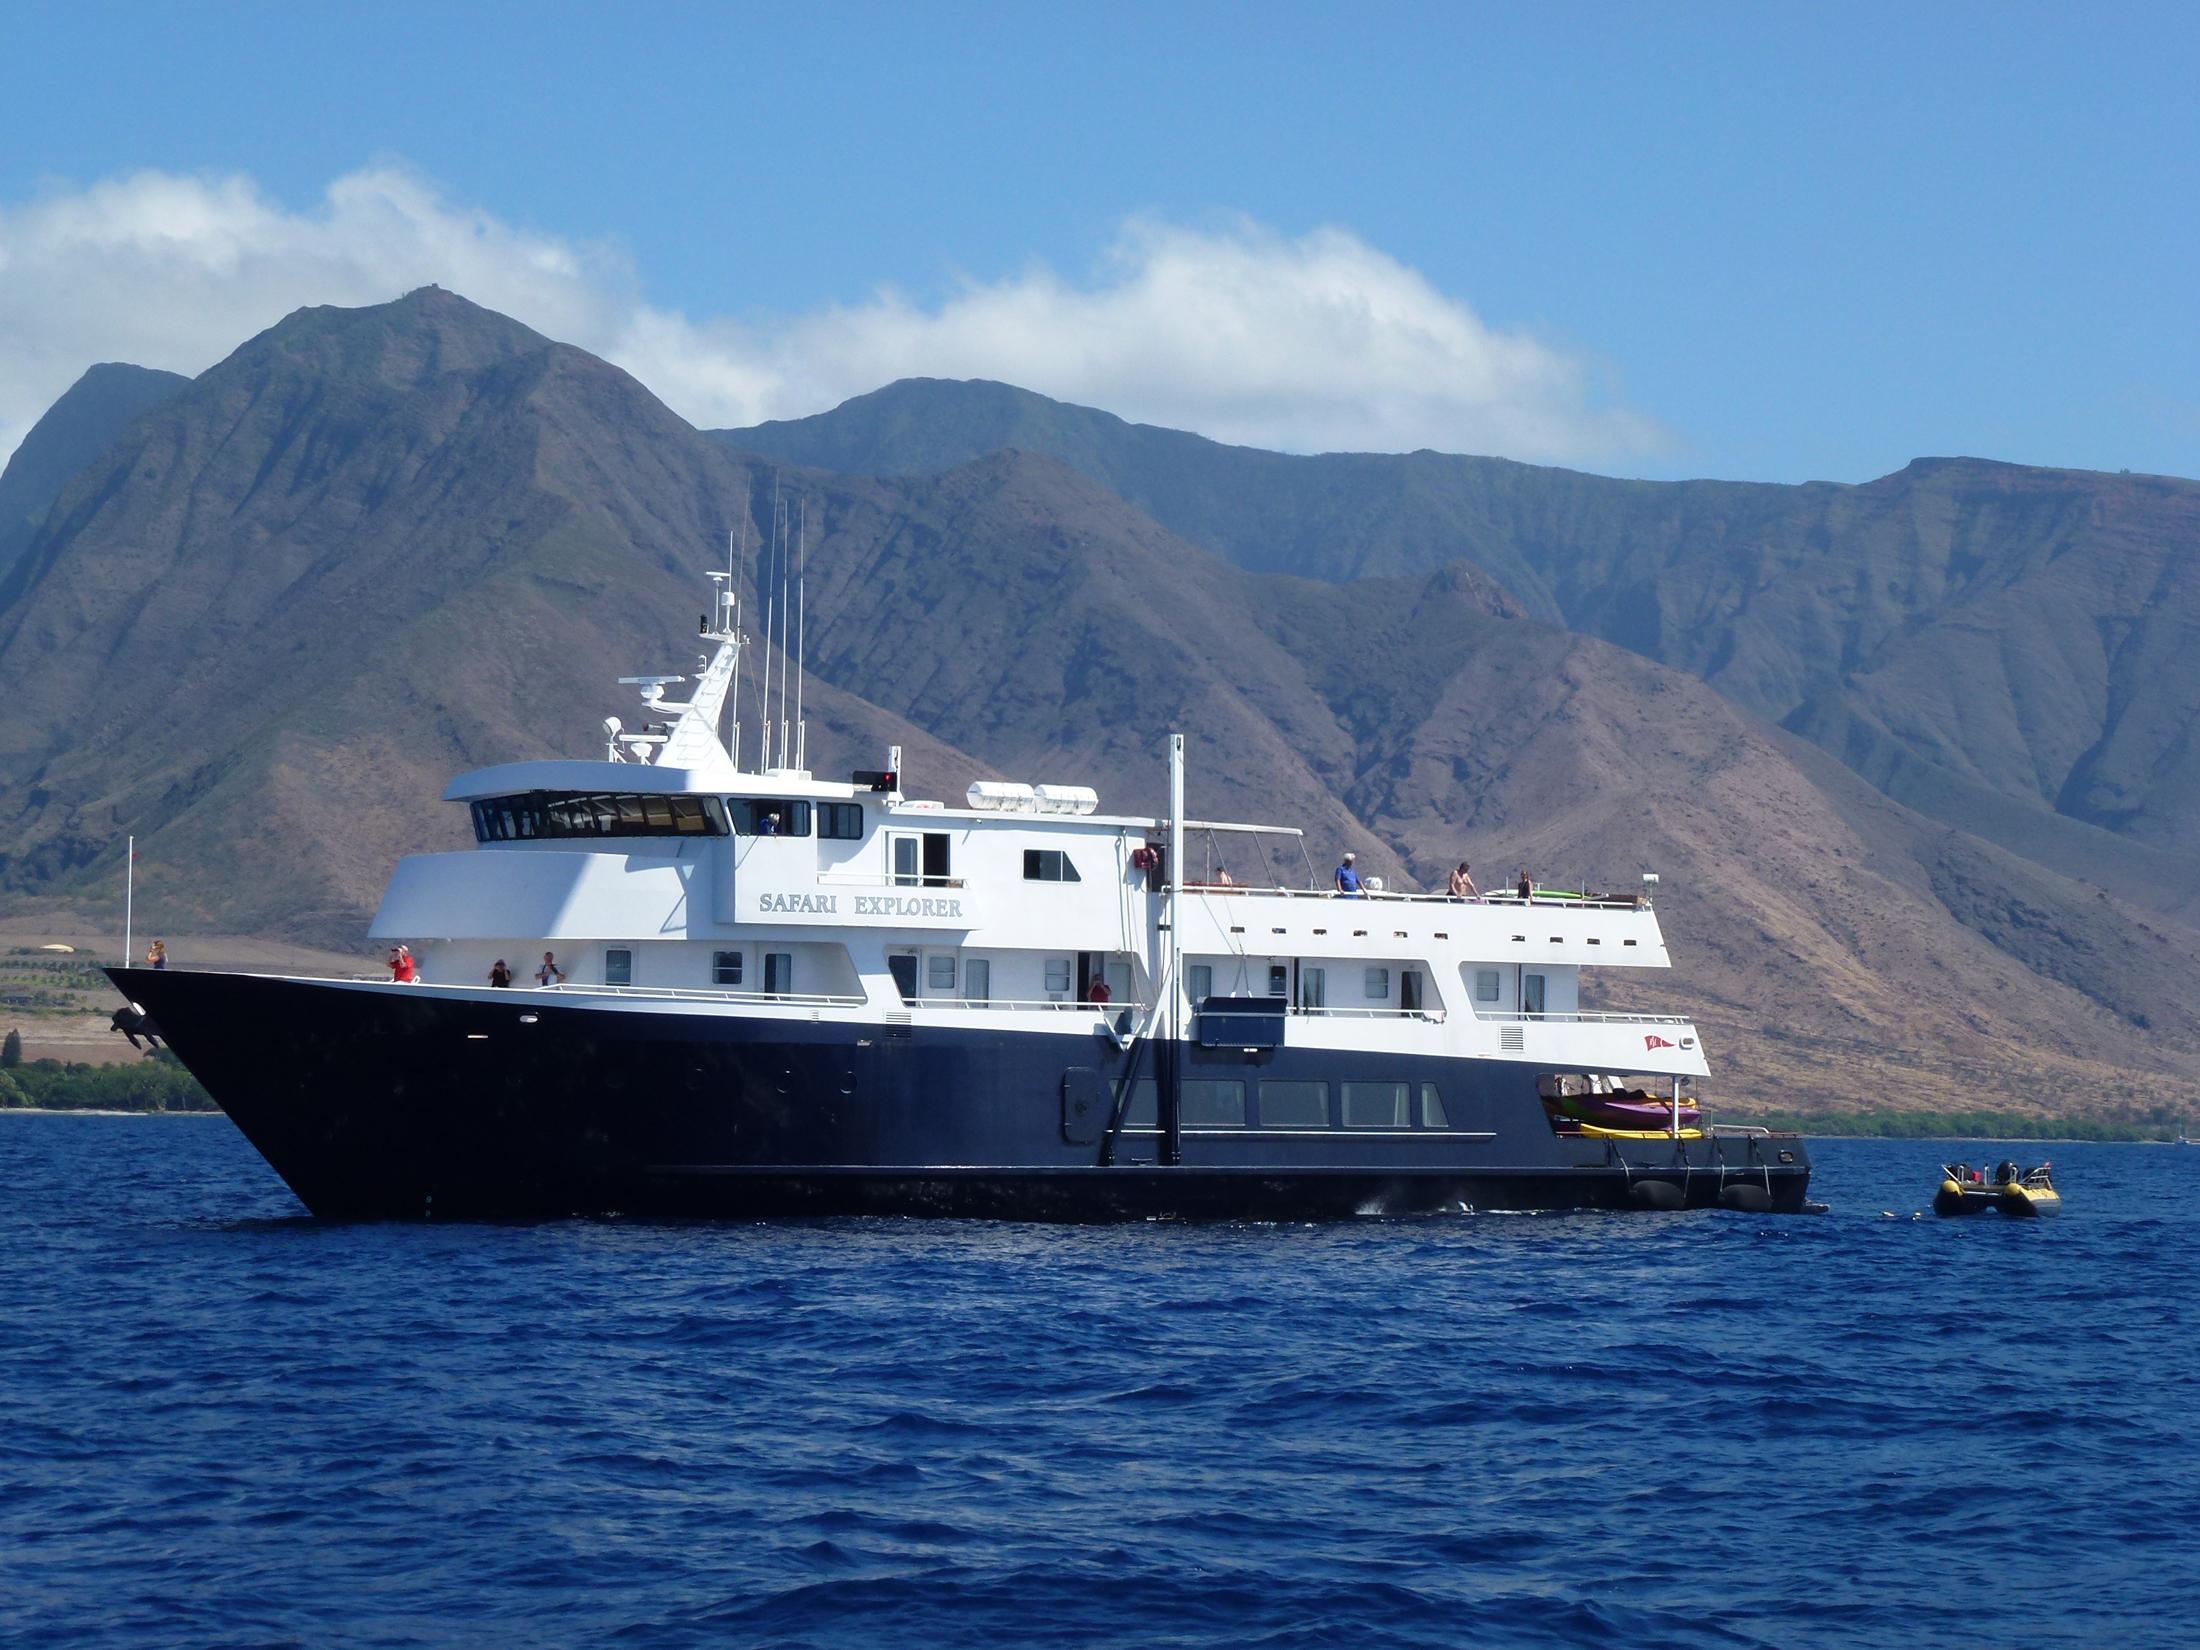 File:Safari Explorer in Hawaii.jpg - Wikimedia Commons